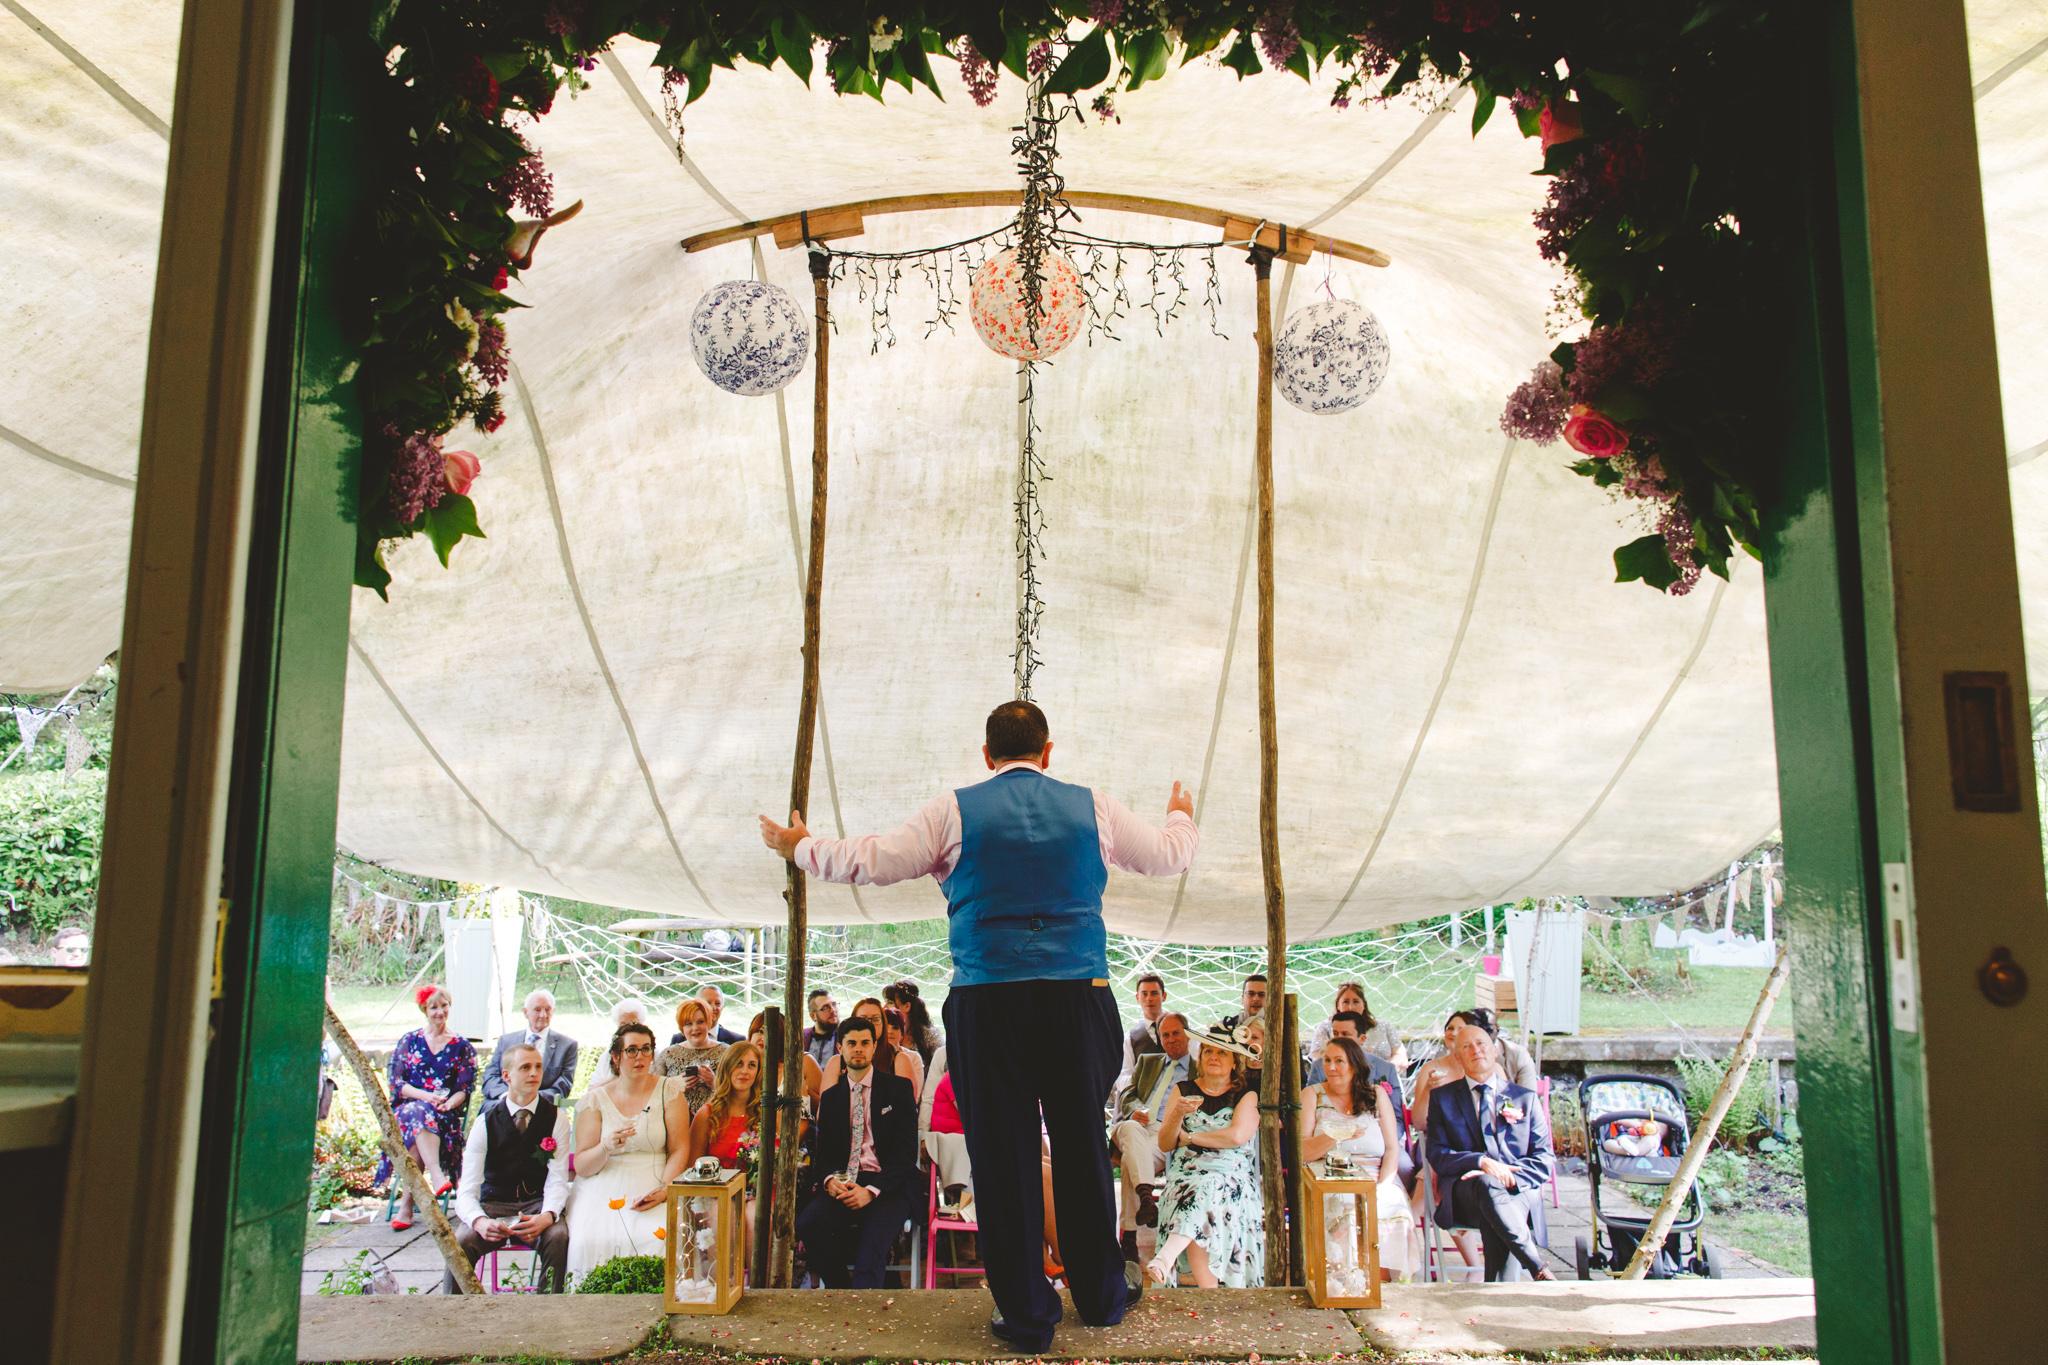 derbyshire-wedding-photographer-videographer-camera-hannah-33.jpg